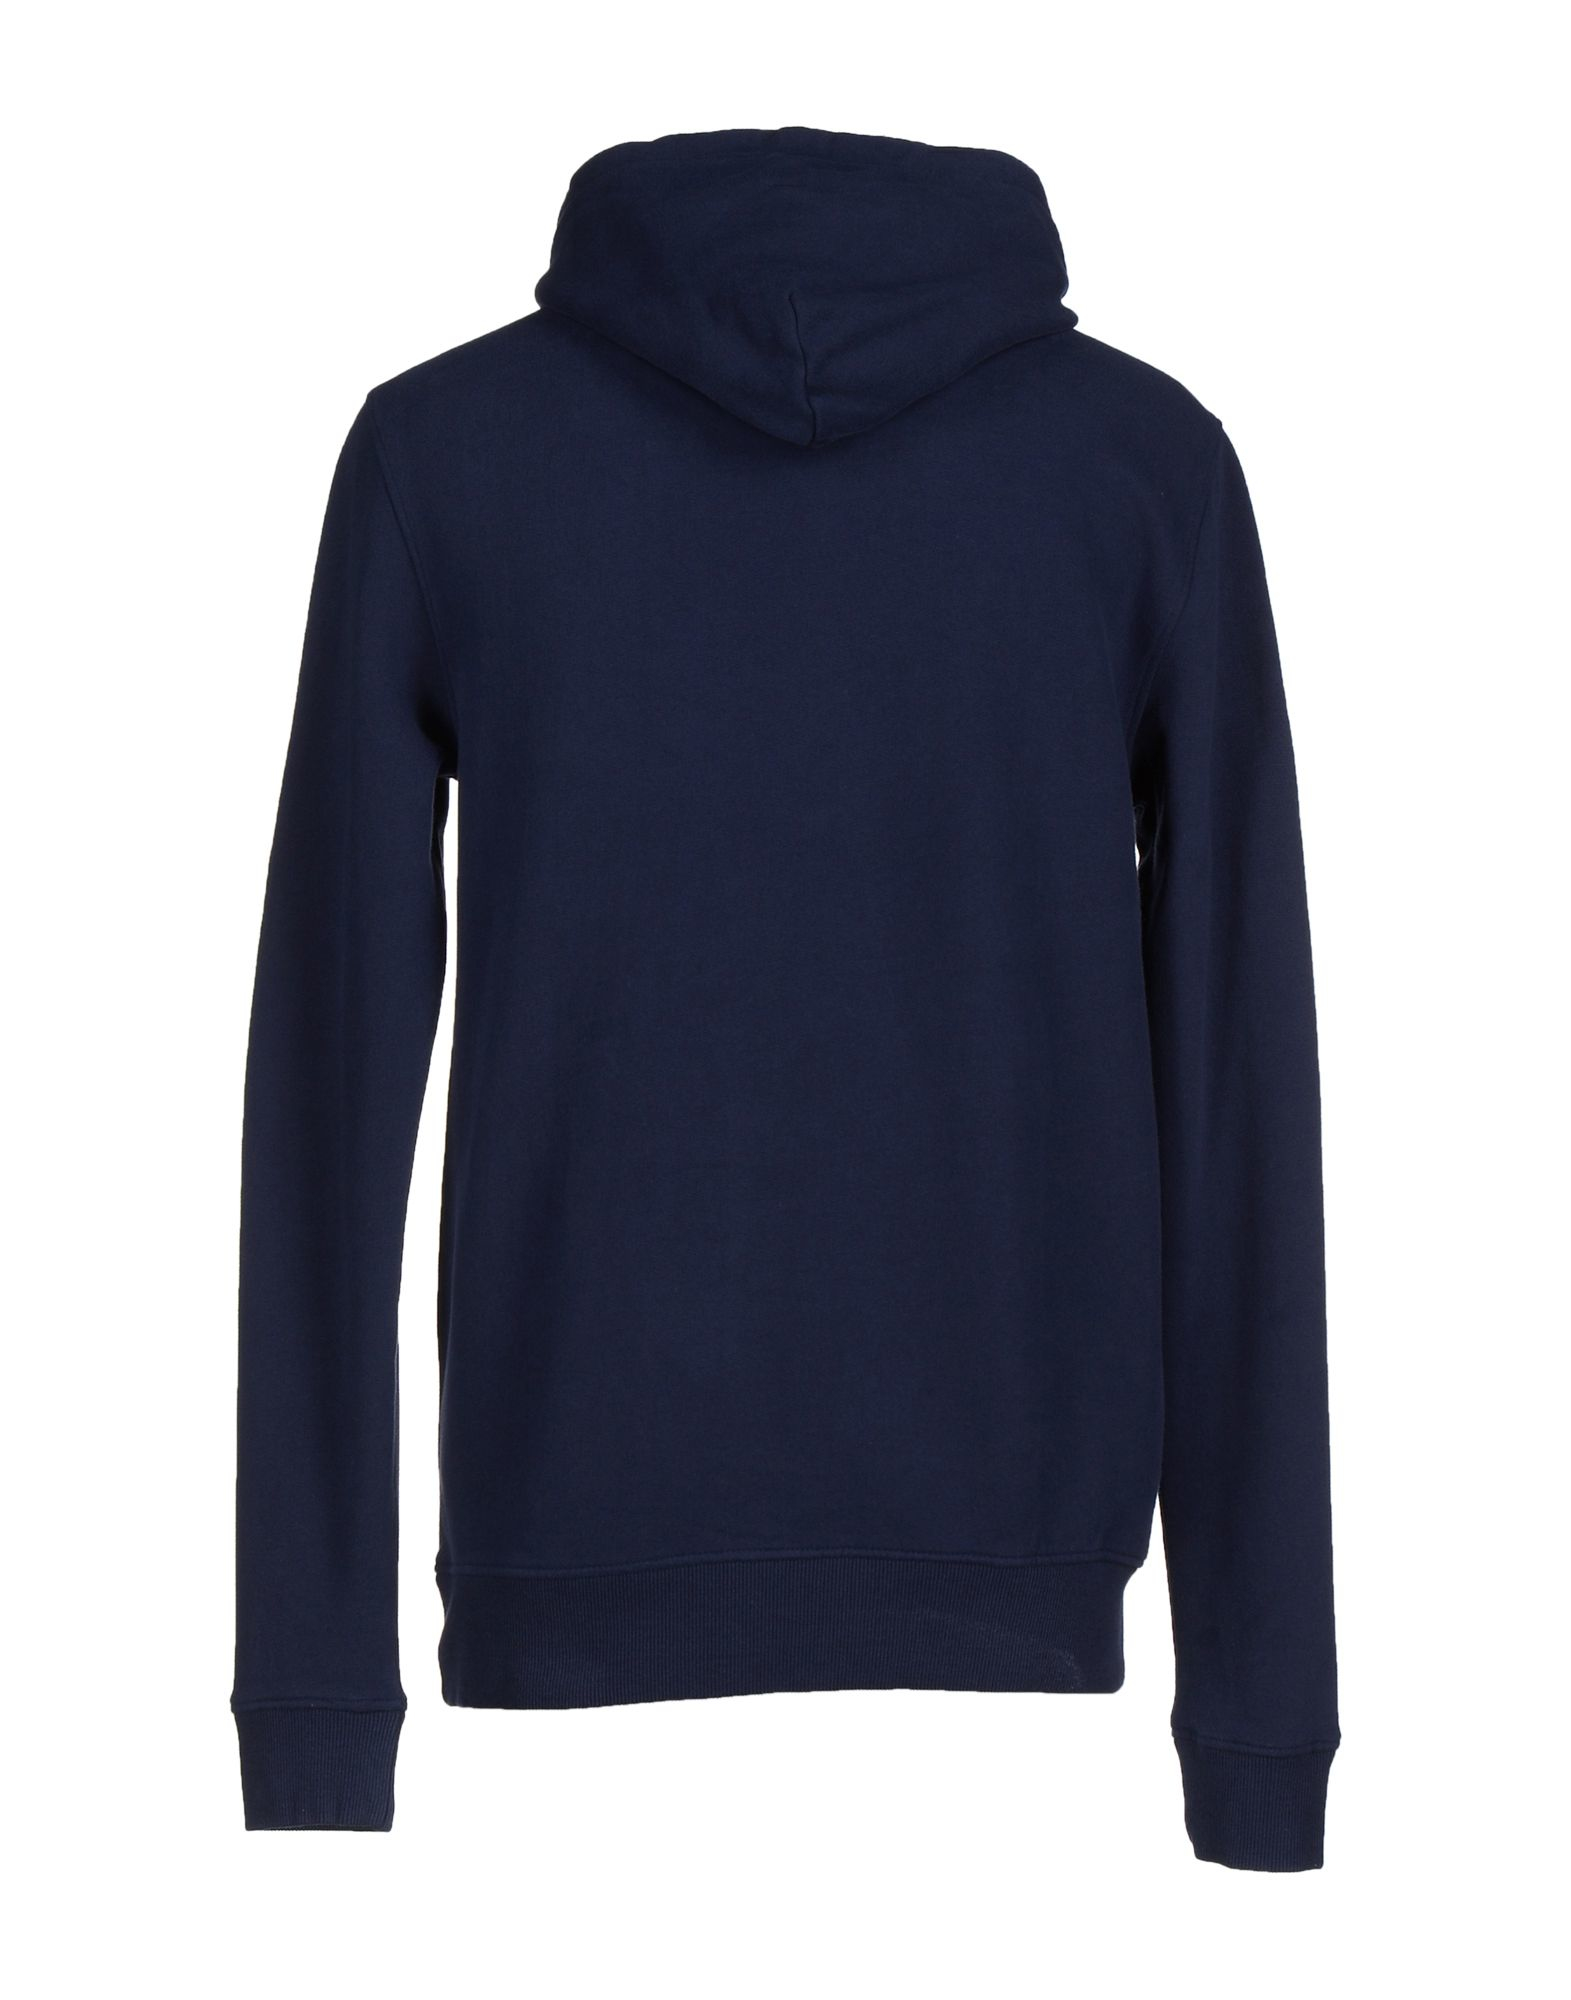 calvin klein jeans sweatshirt in blue lyst. Black Bedroom Furniture Sets. Home Design Ideas